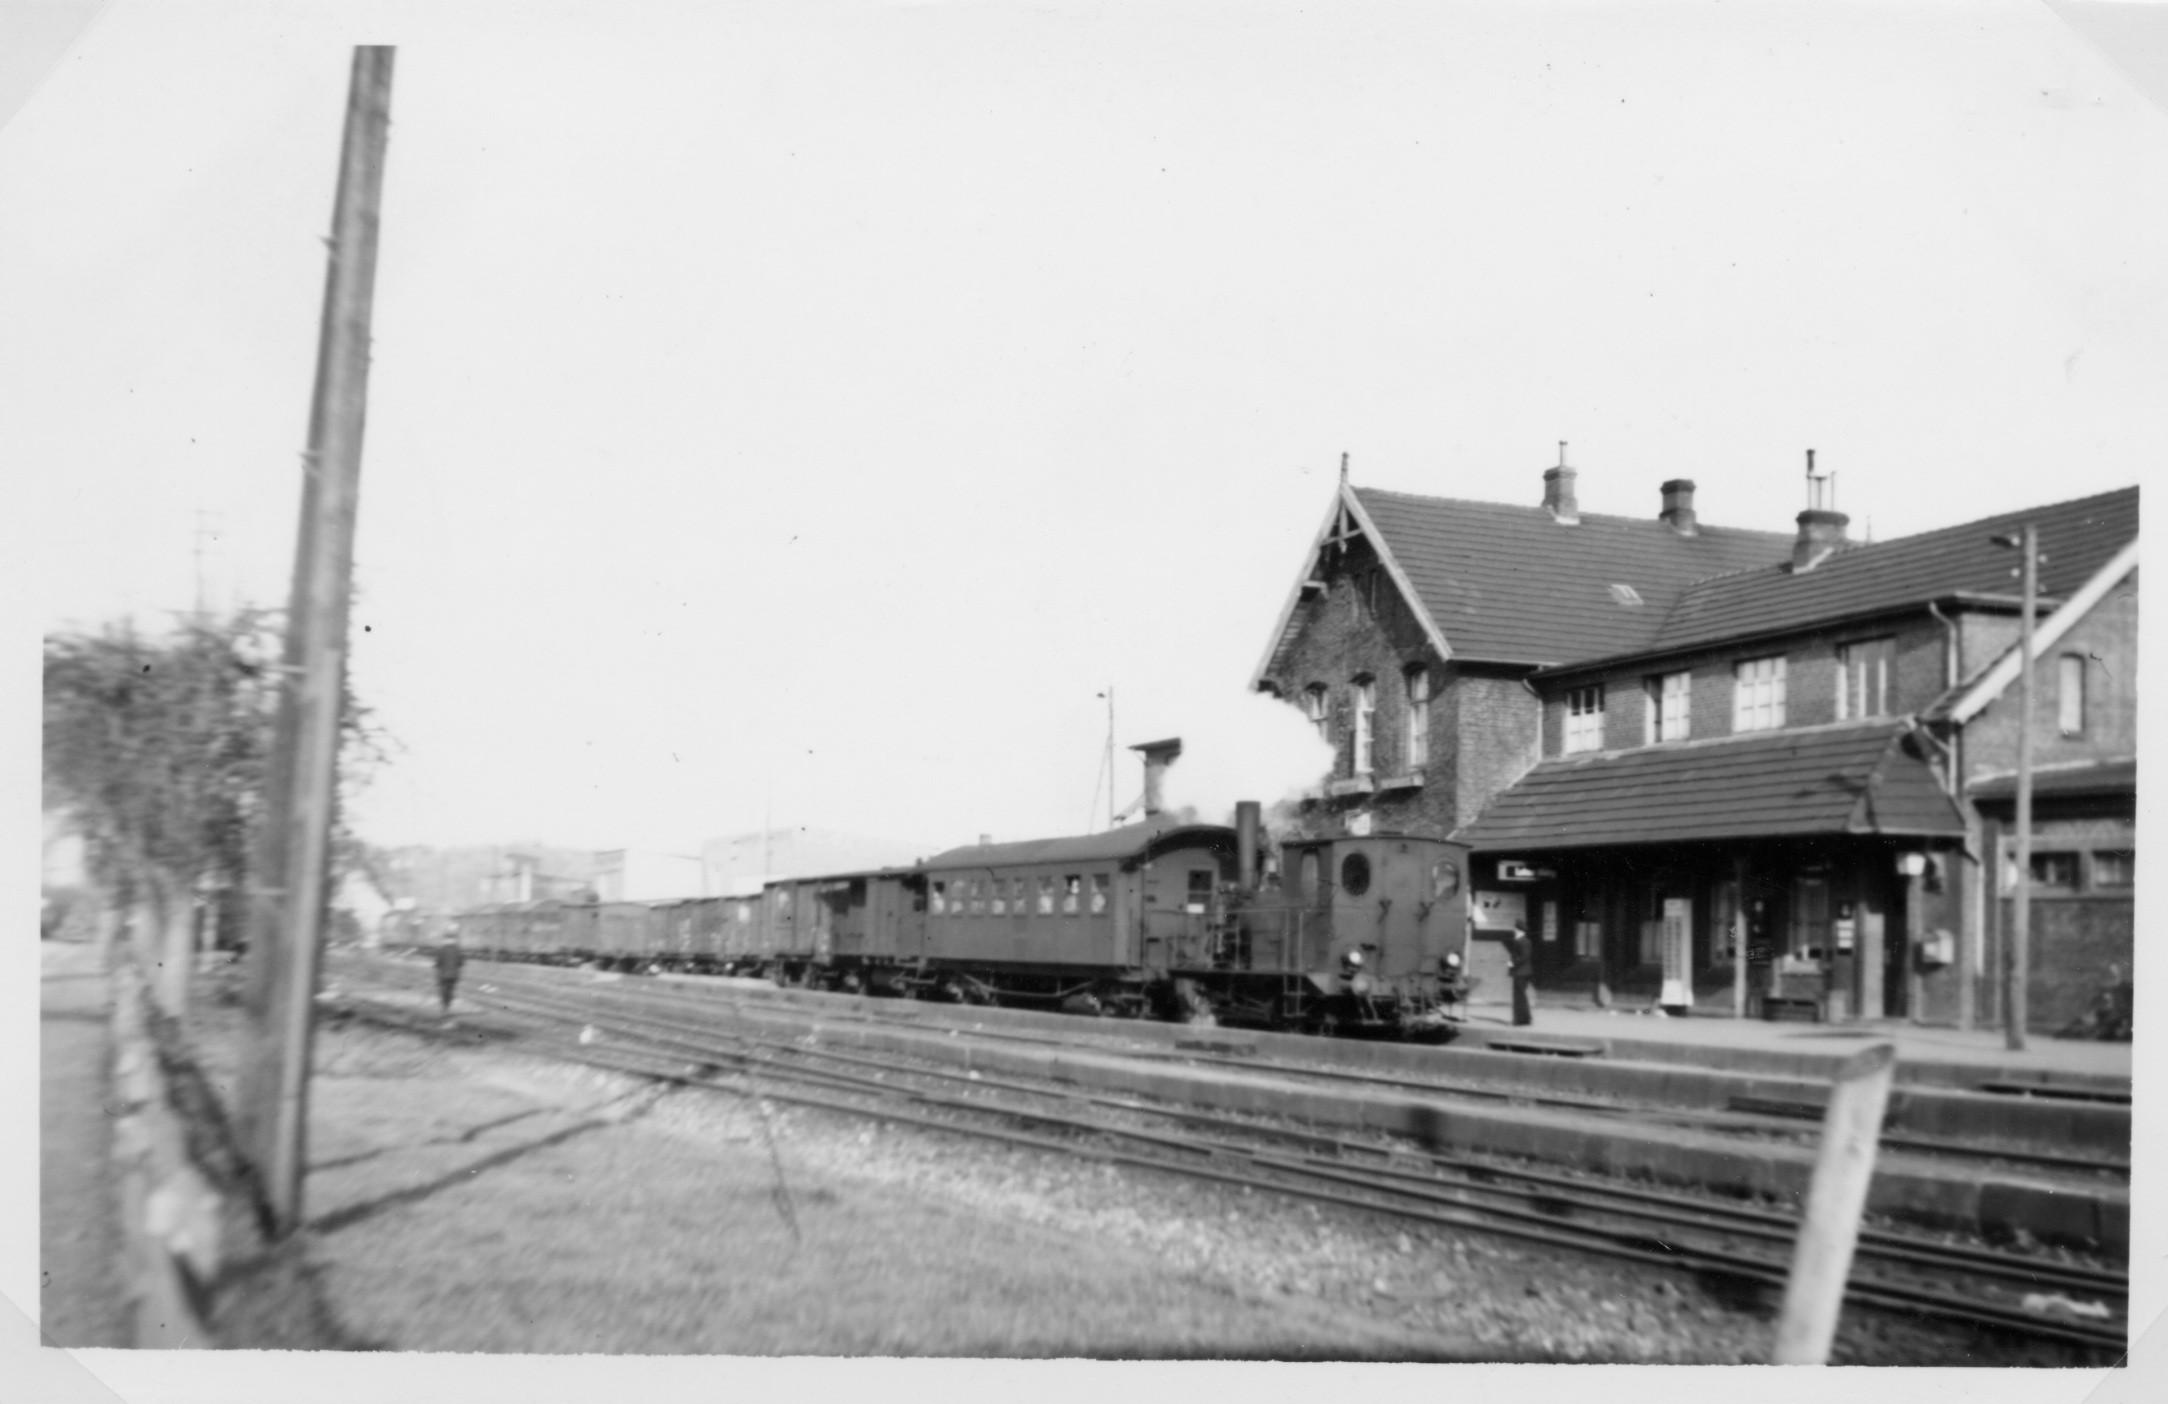 Bahnhof Löhne der bahnhof alt dinklage